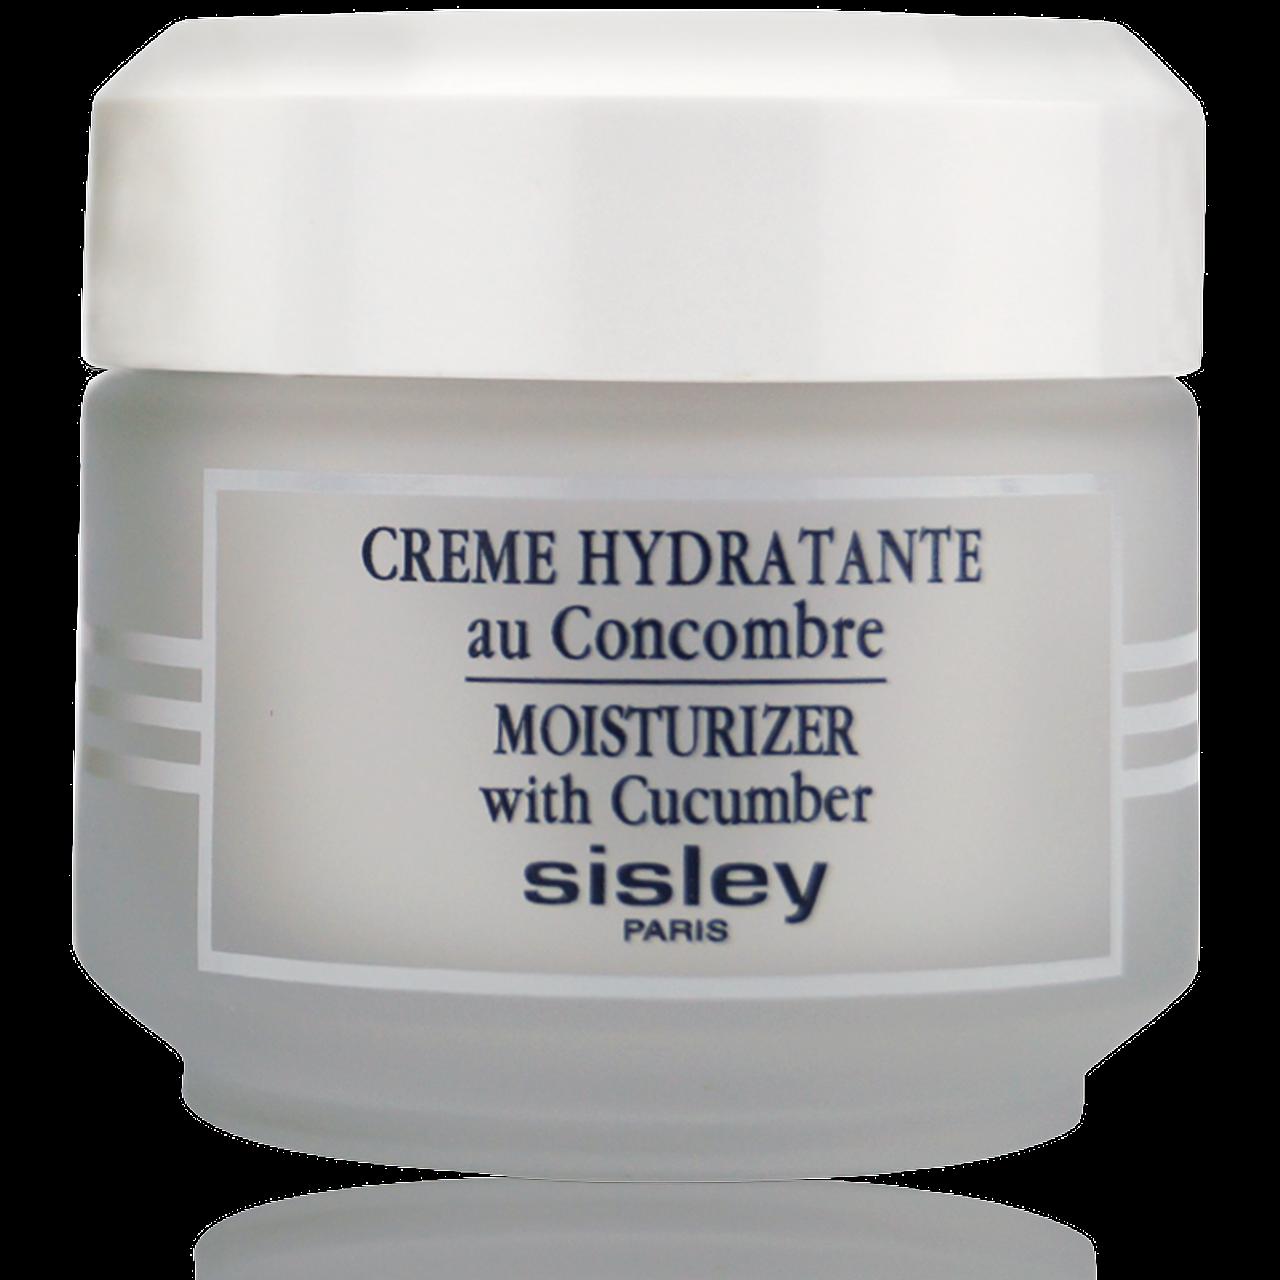 Sisley Creme Hydratante au Concombre Gesichtscreme 50ml